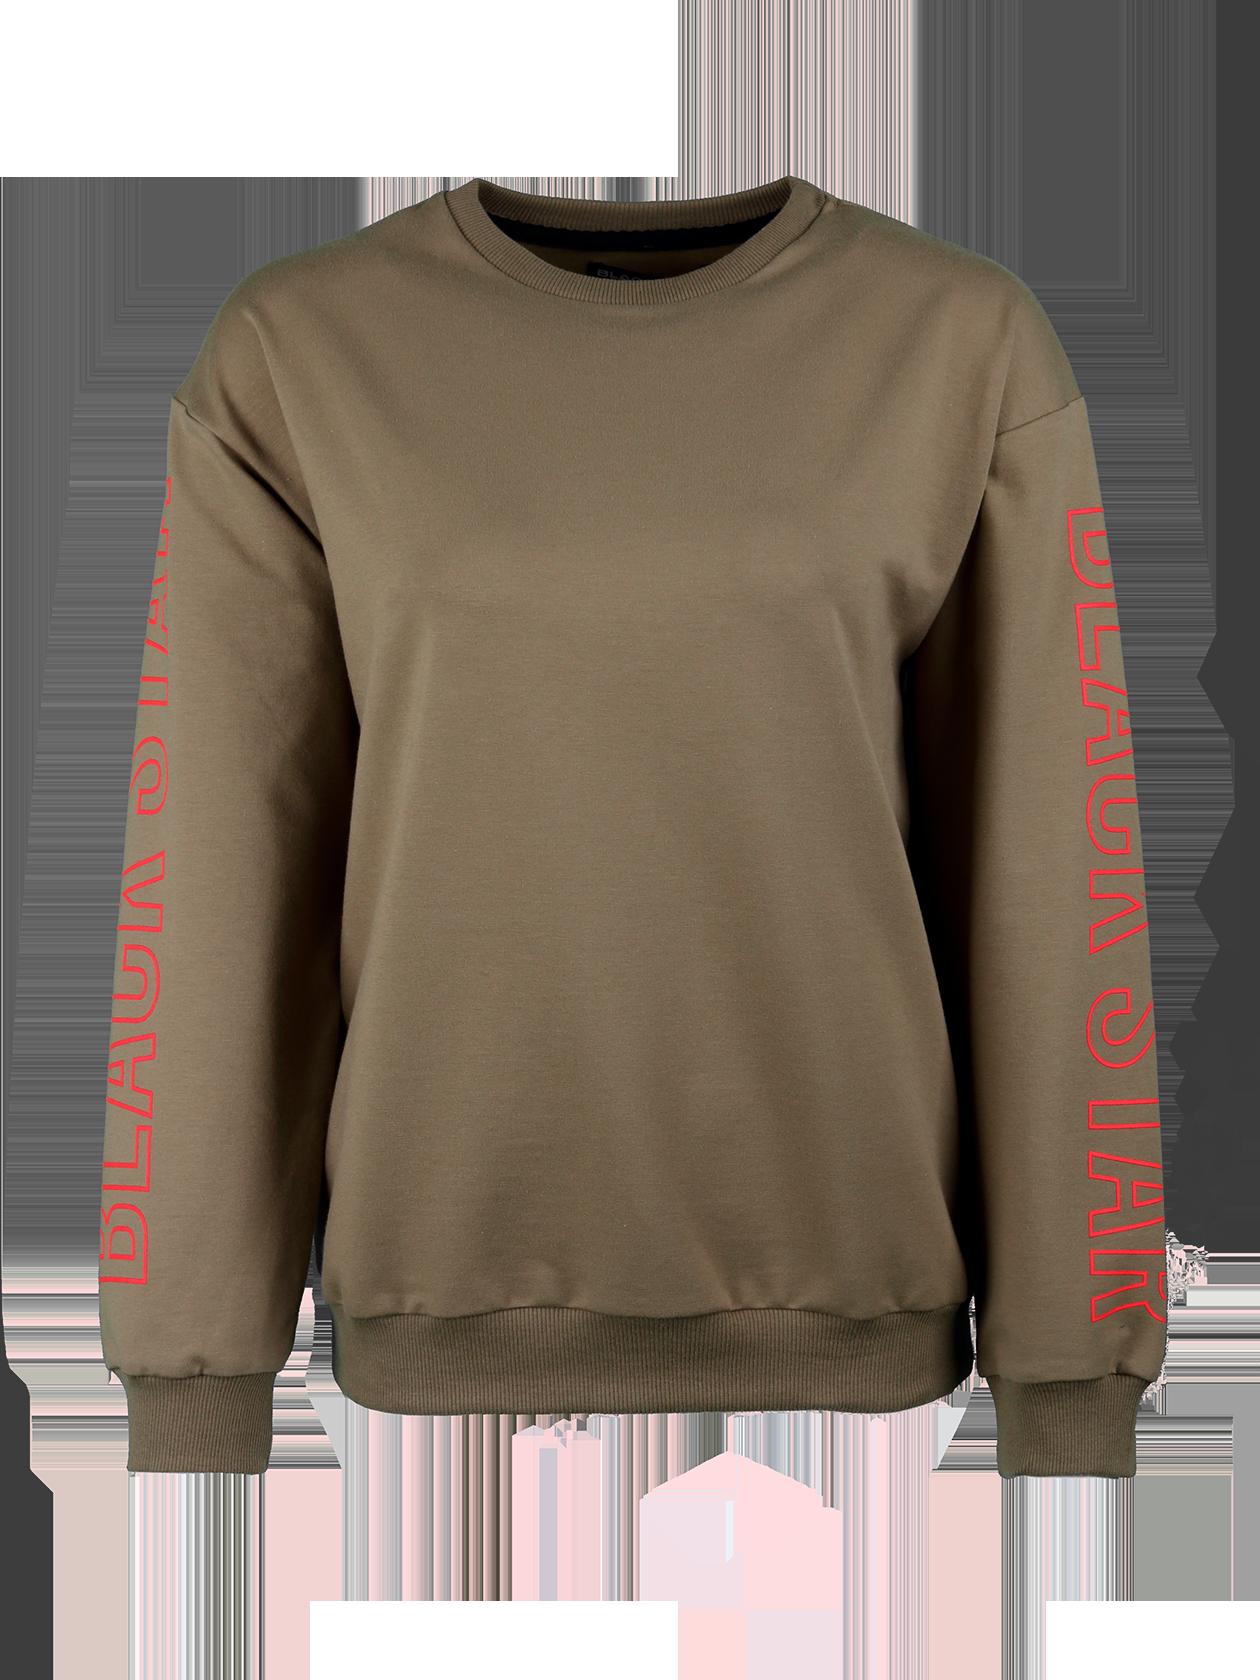 Womens sweatshirt Outline